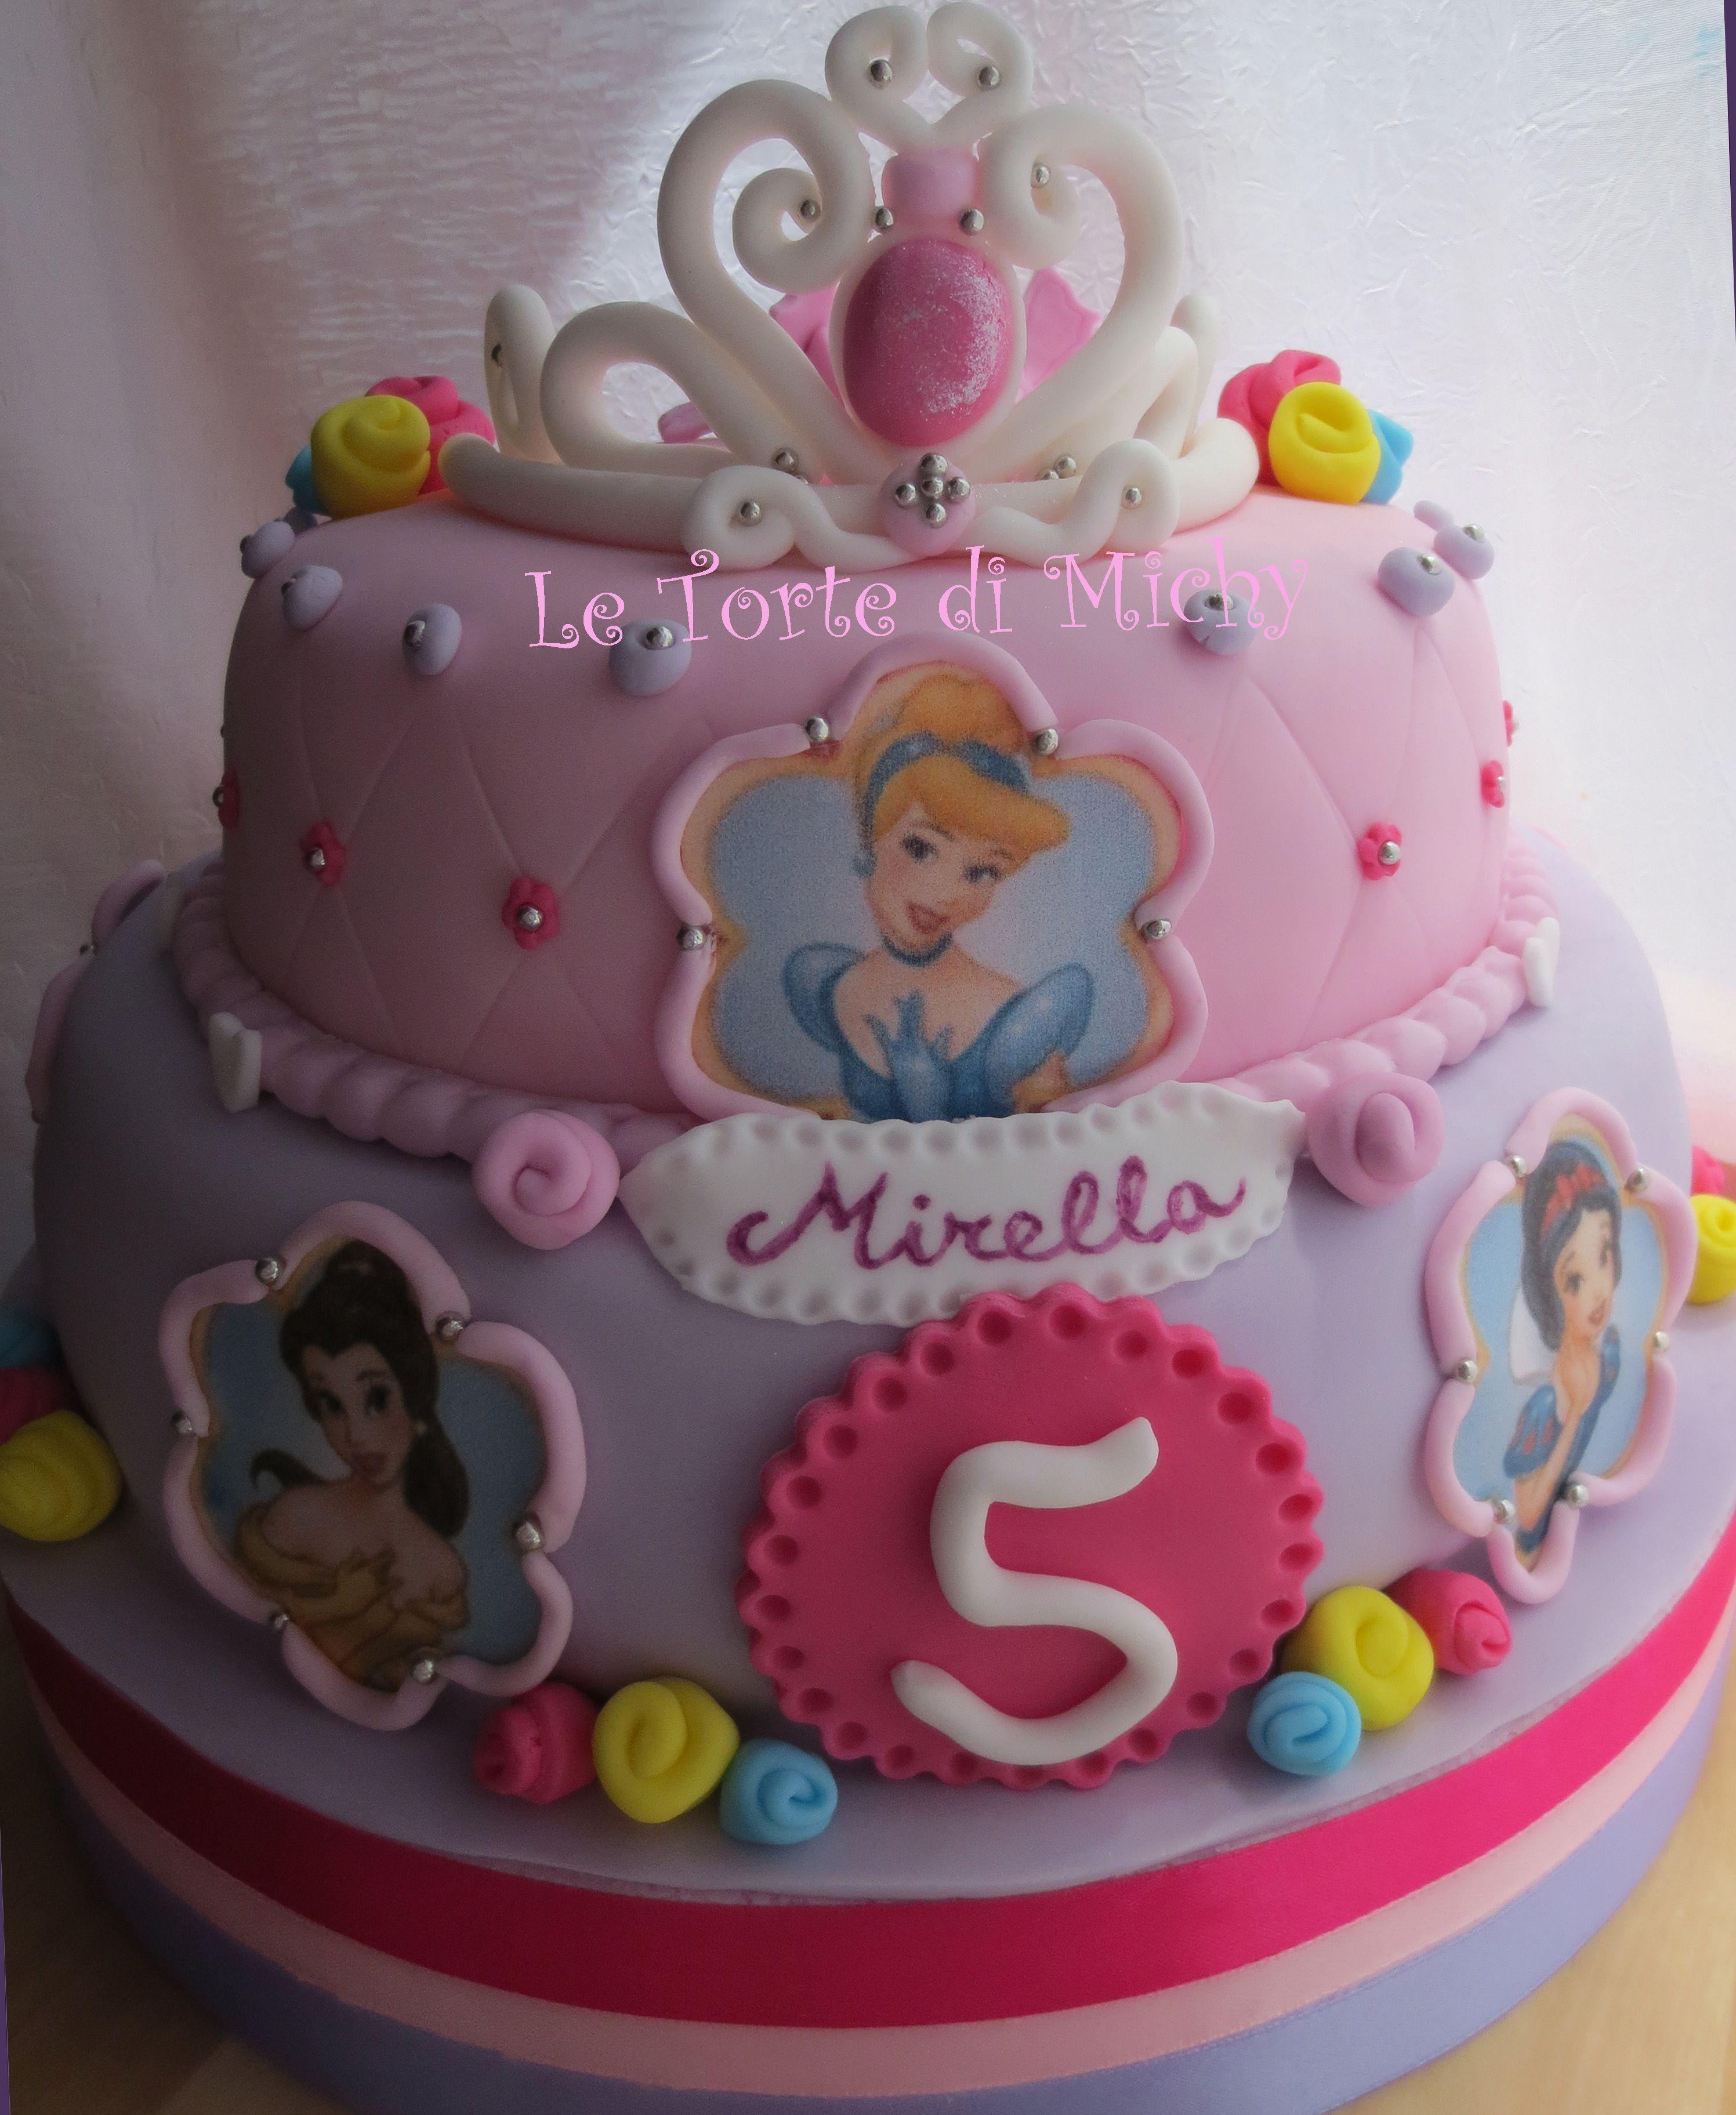 Sensational Disney Princesses Cake Princess Birthday Cake Disney Princess Funny Birthday Cards Online Aboleapandamsfinfo